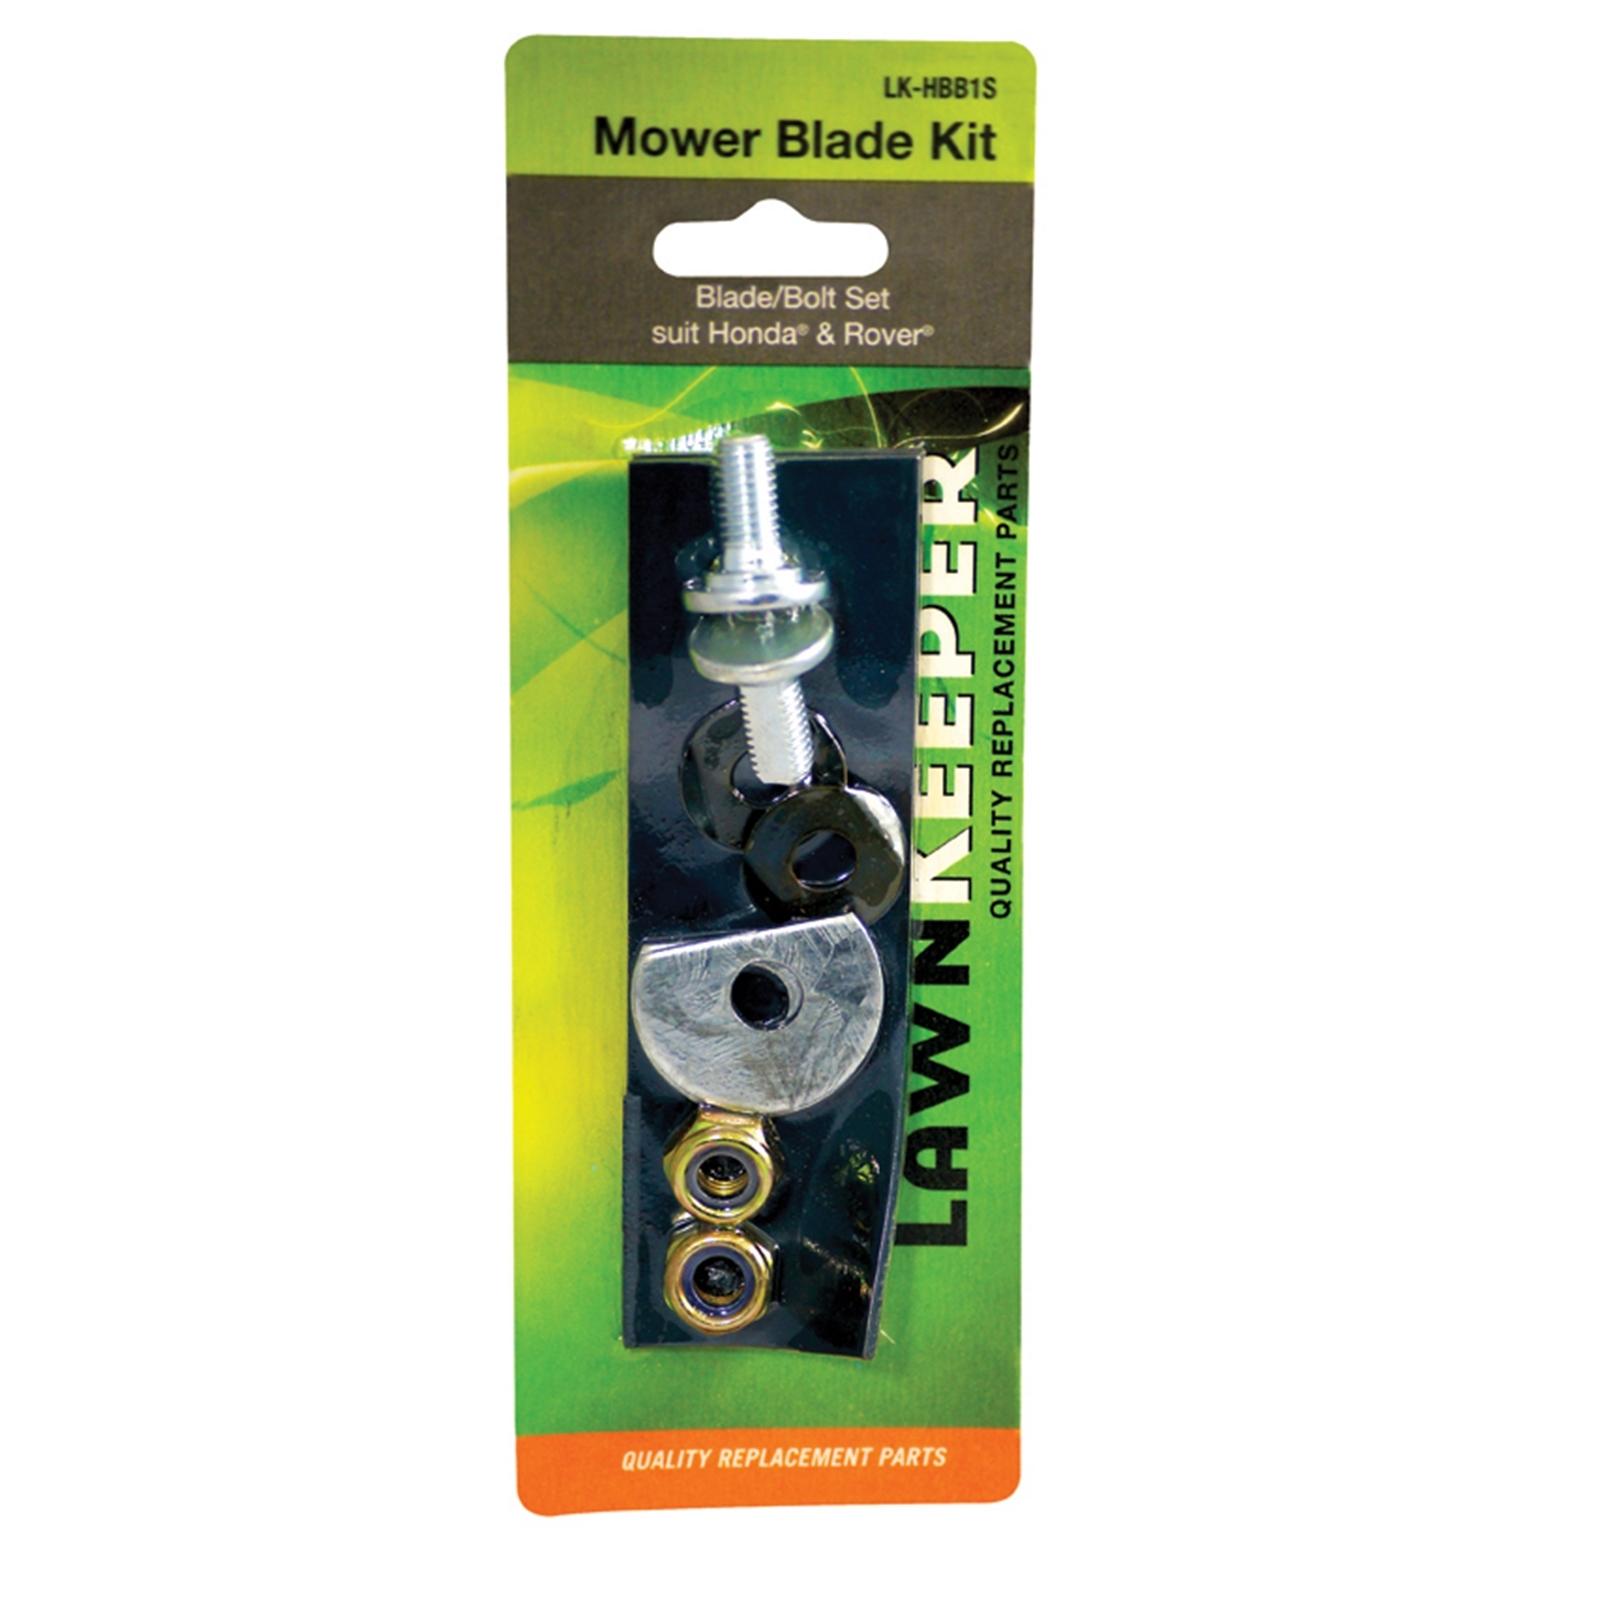 LawnKeeper Mower Blade & Bolt Set